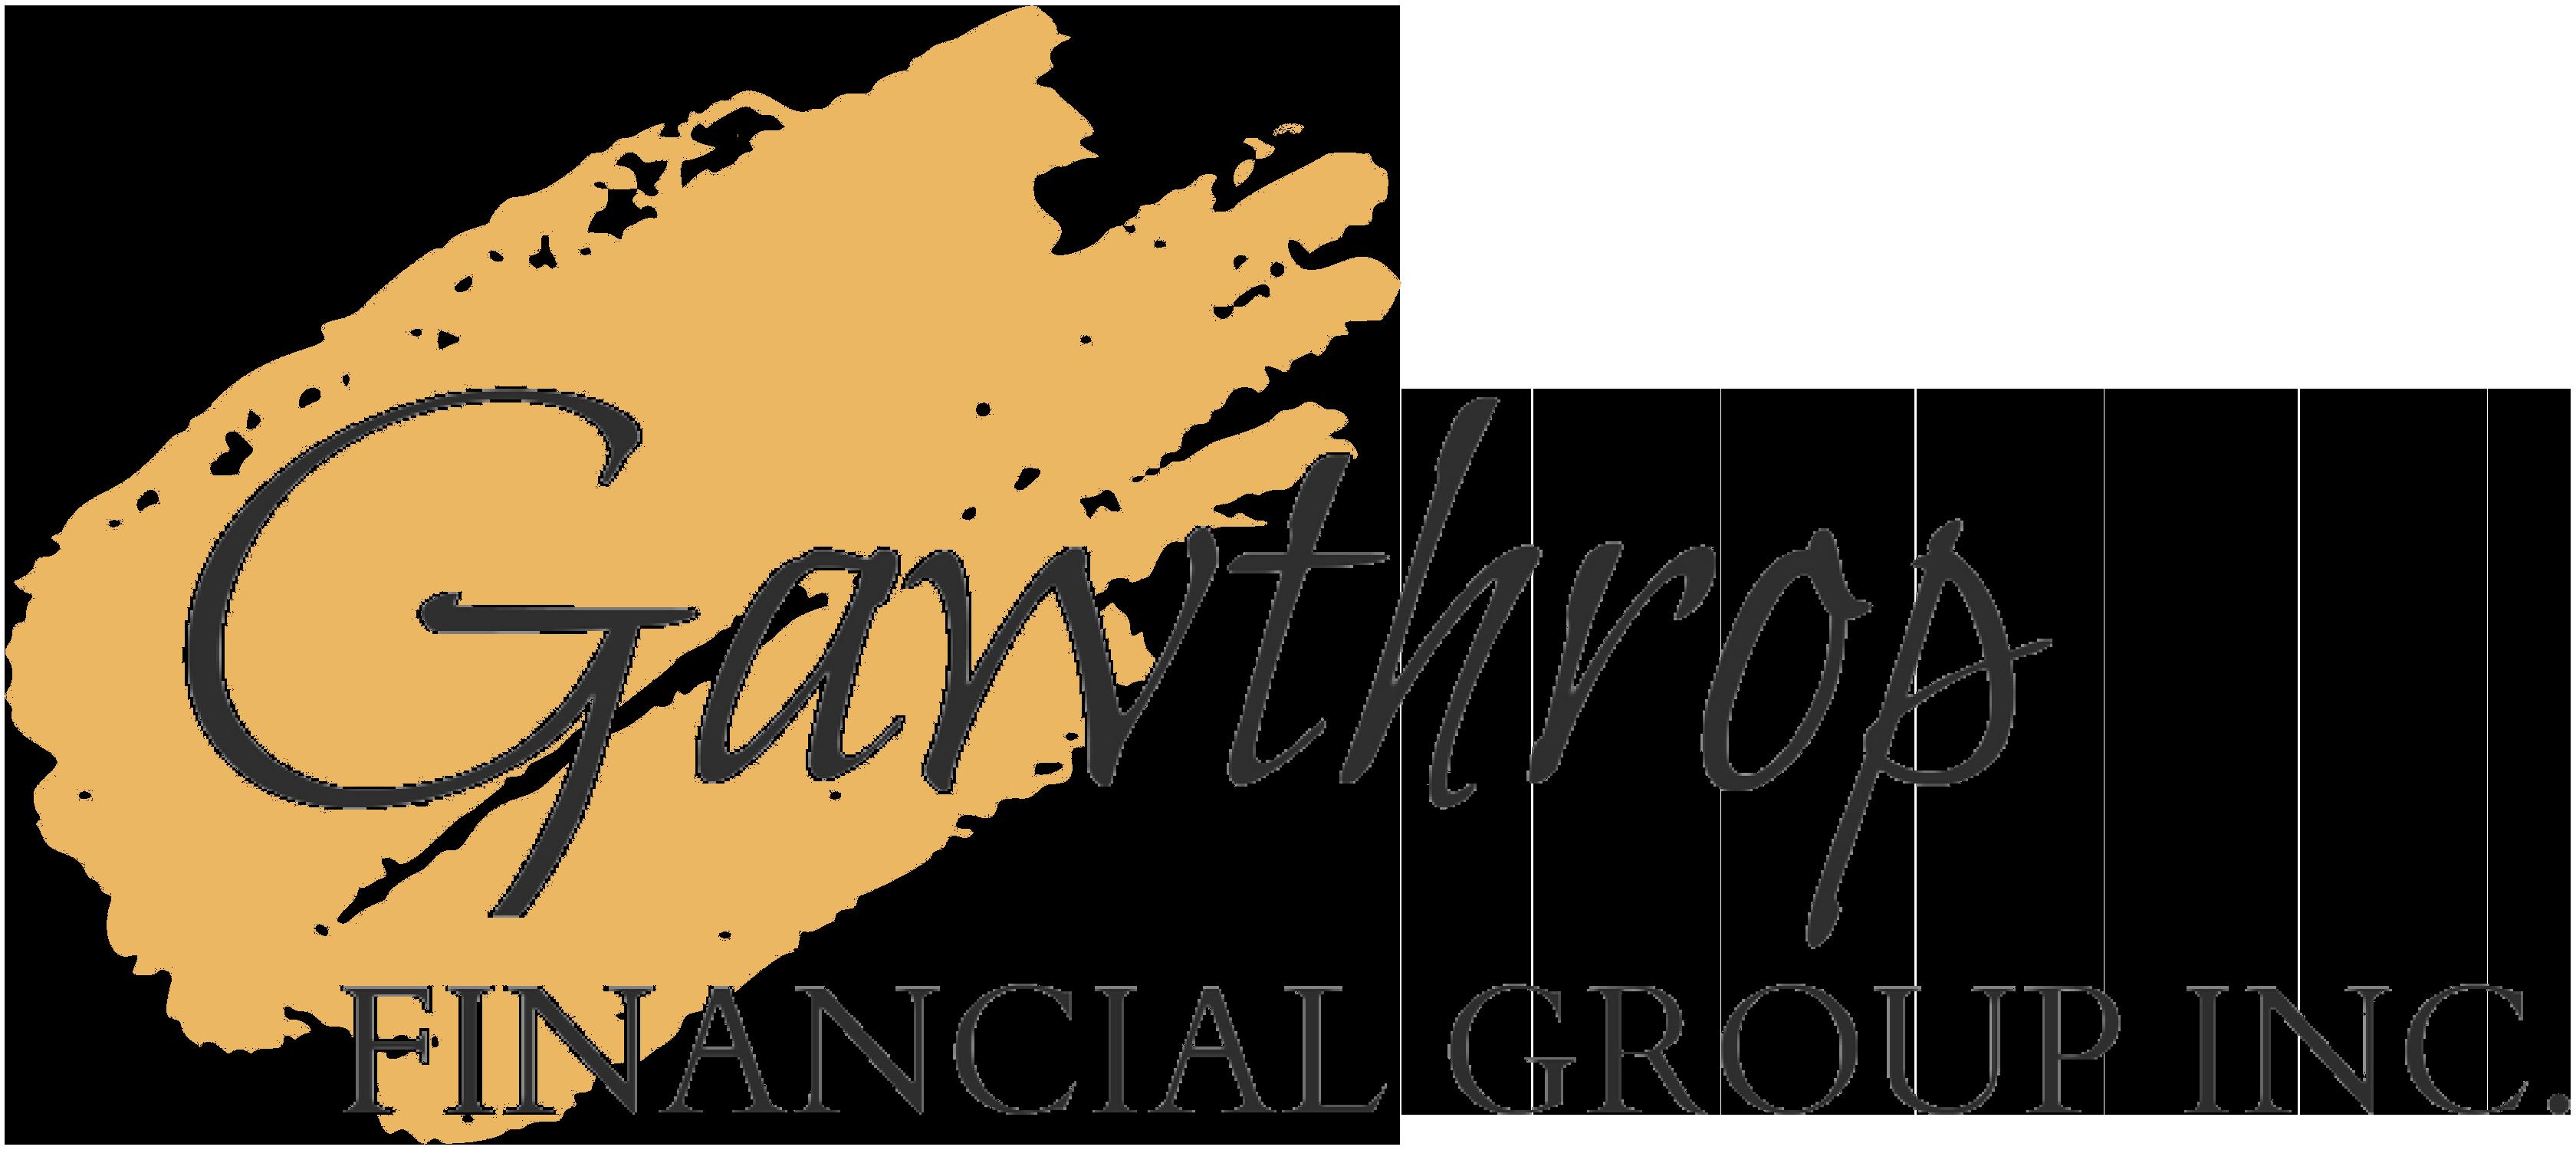 gawthrop-logo-primary-expanded